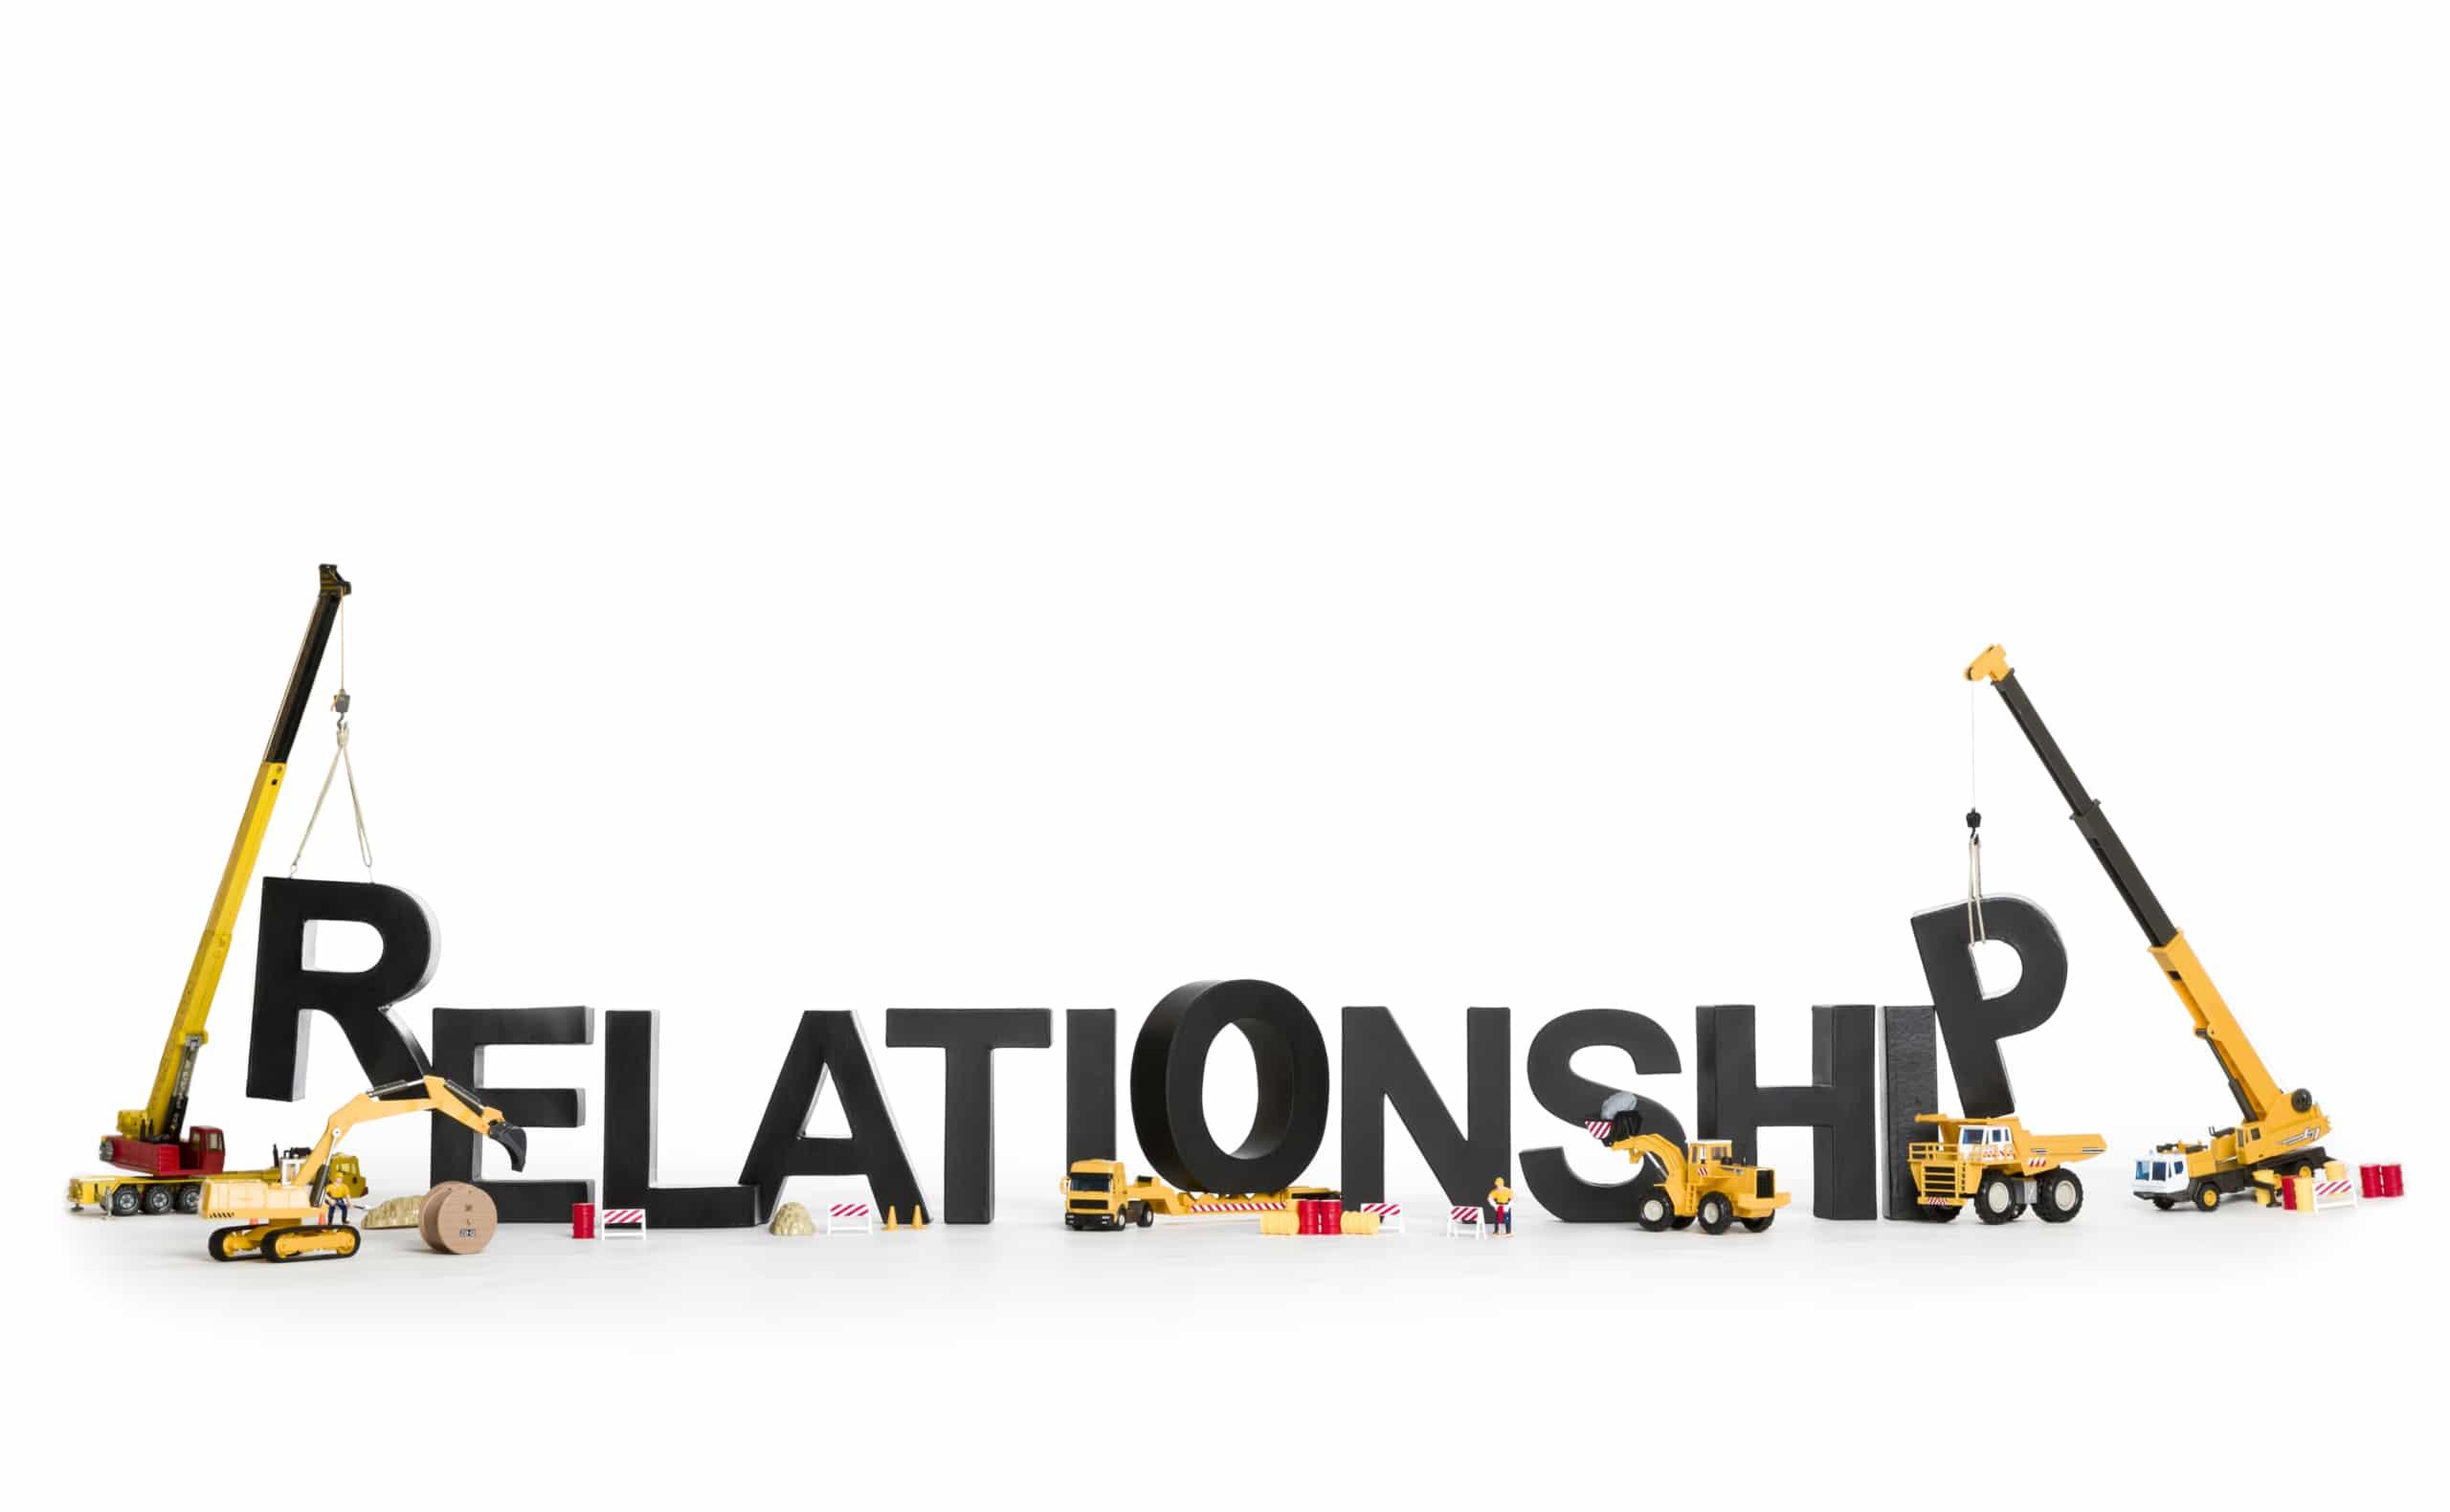 Relationship Building